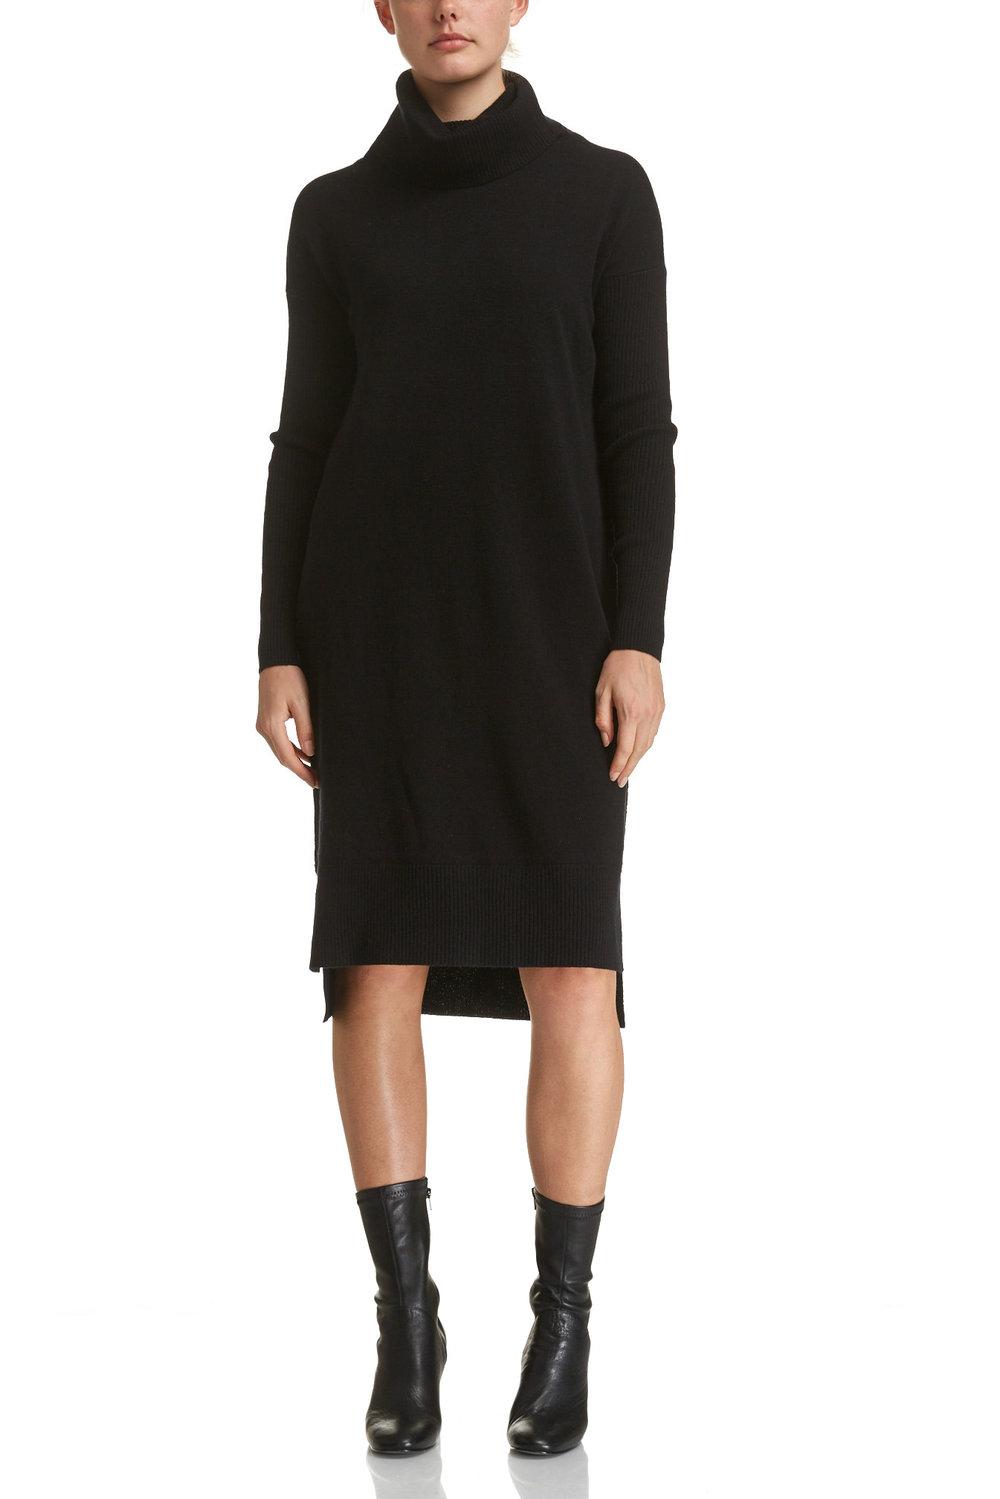 Saba Knit Dress.jpg